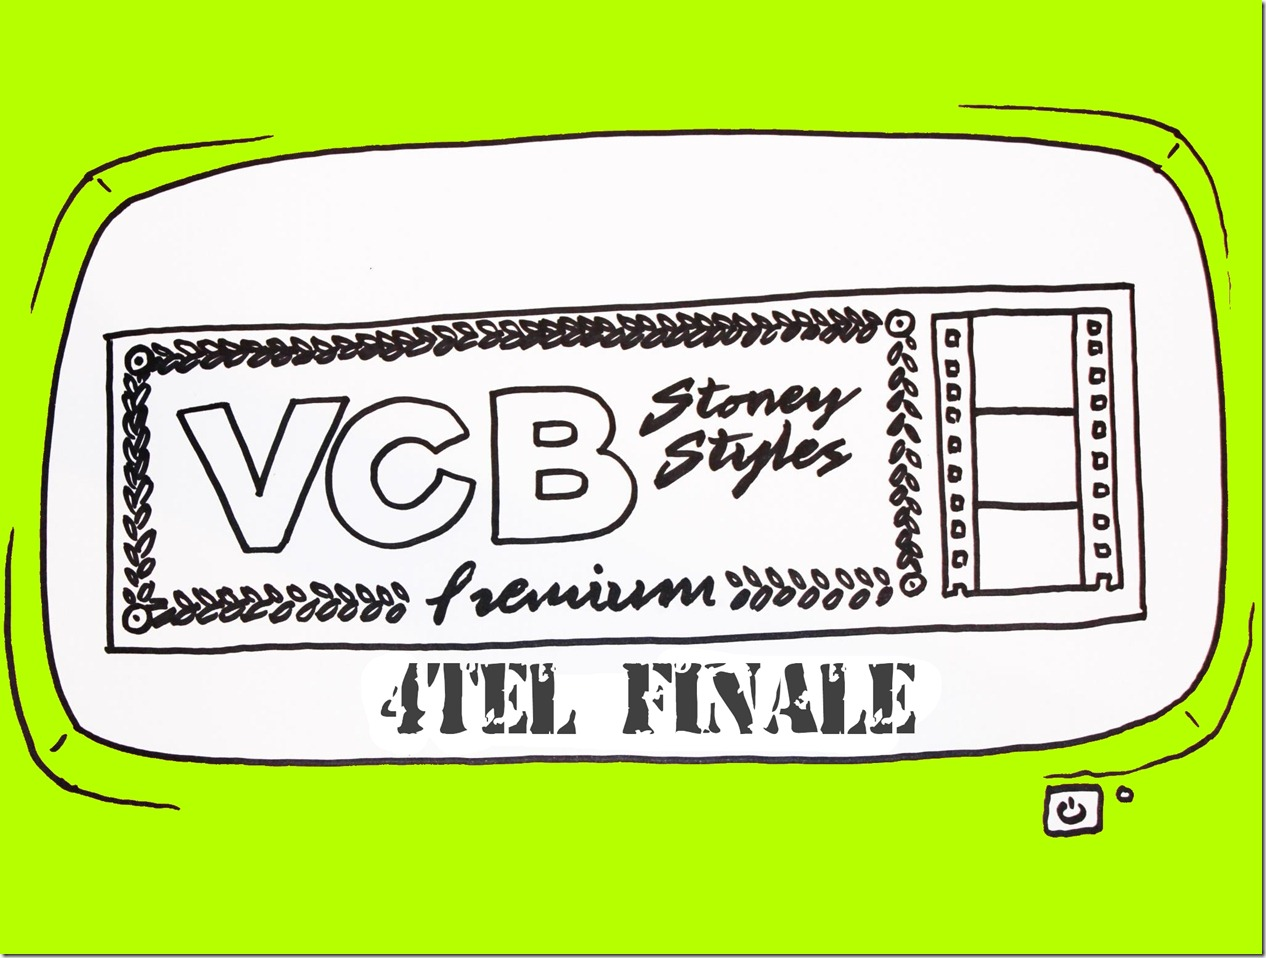 VCB-4tel-Finale-2012-Rueckrunde-Hinrunde